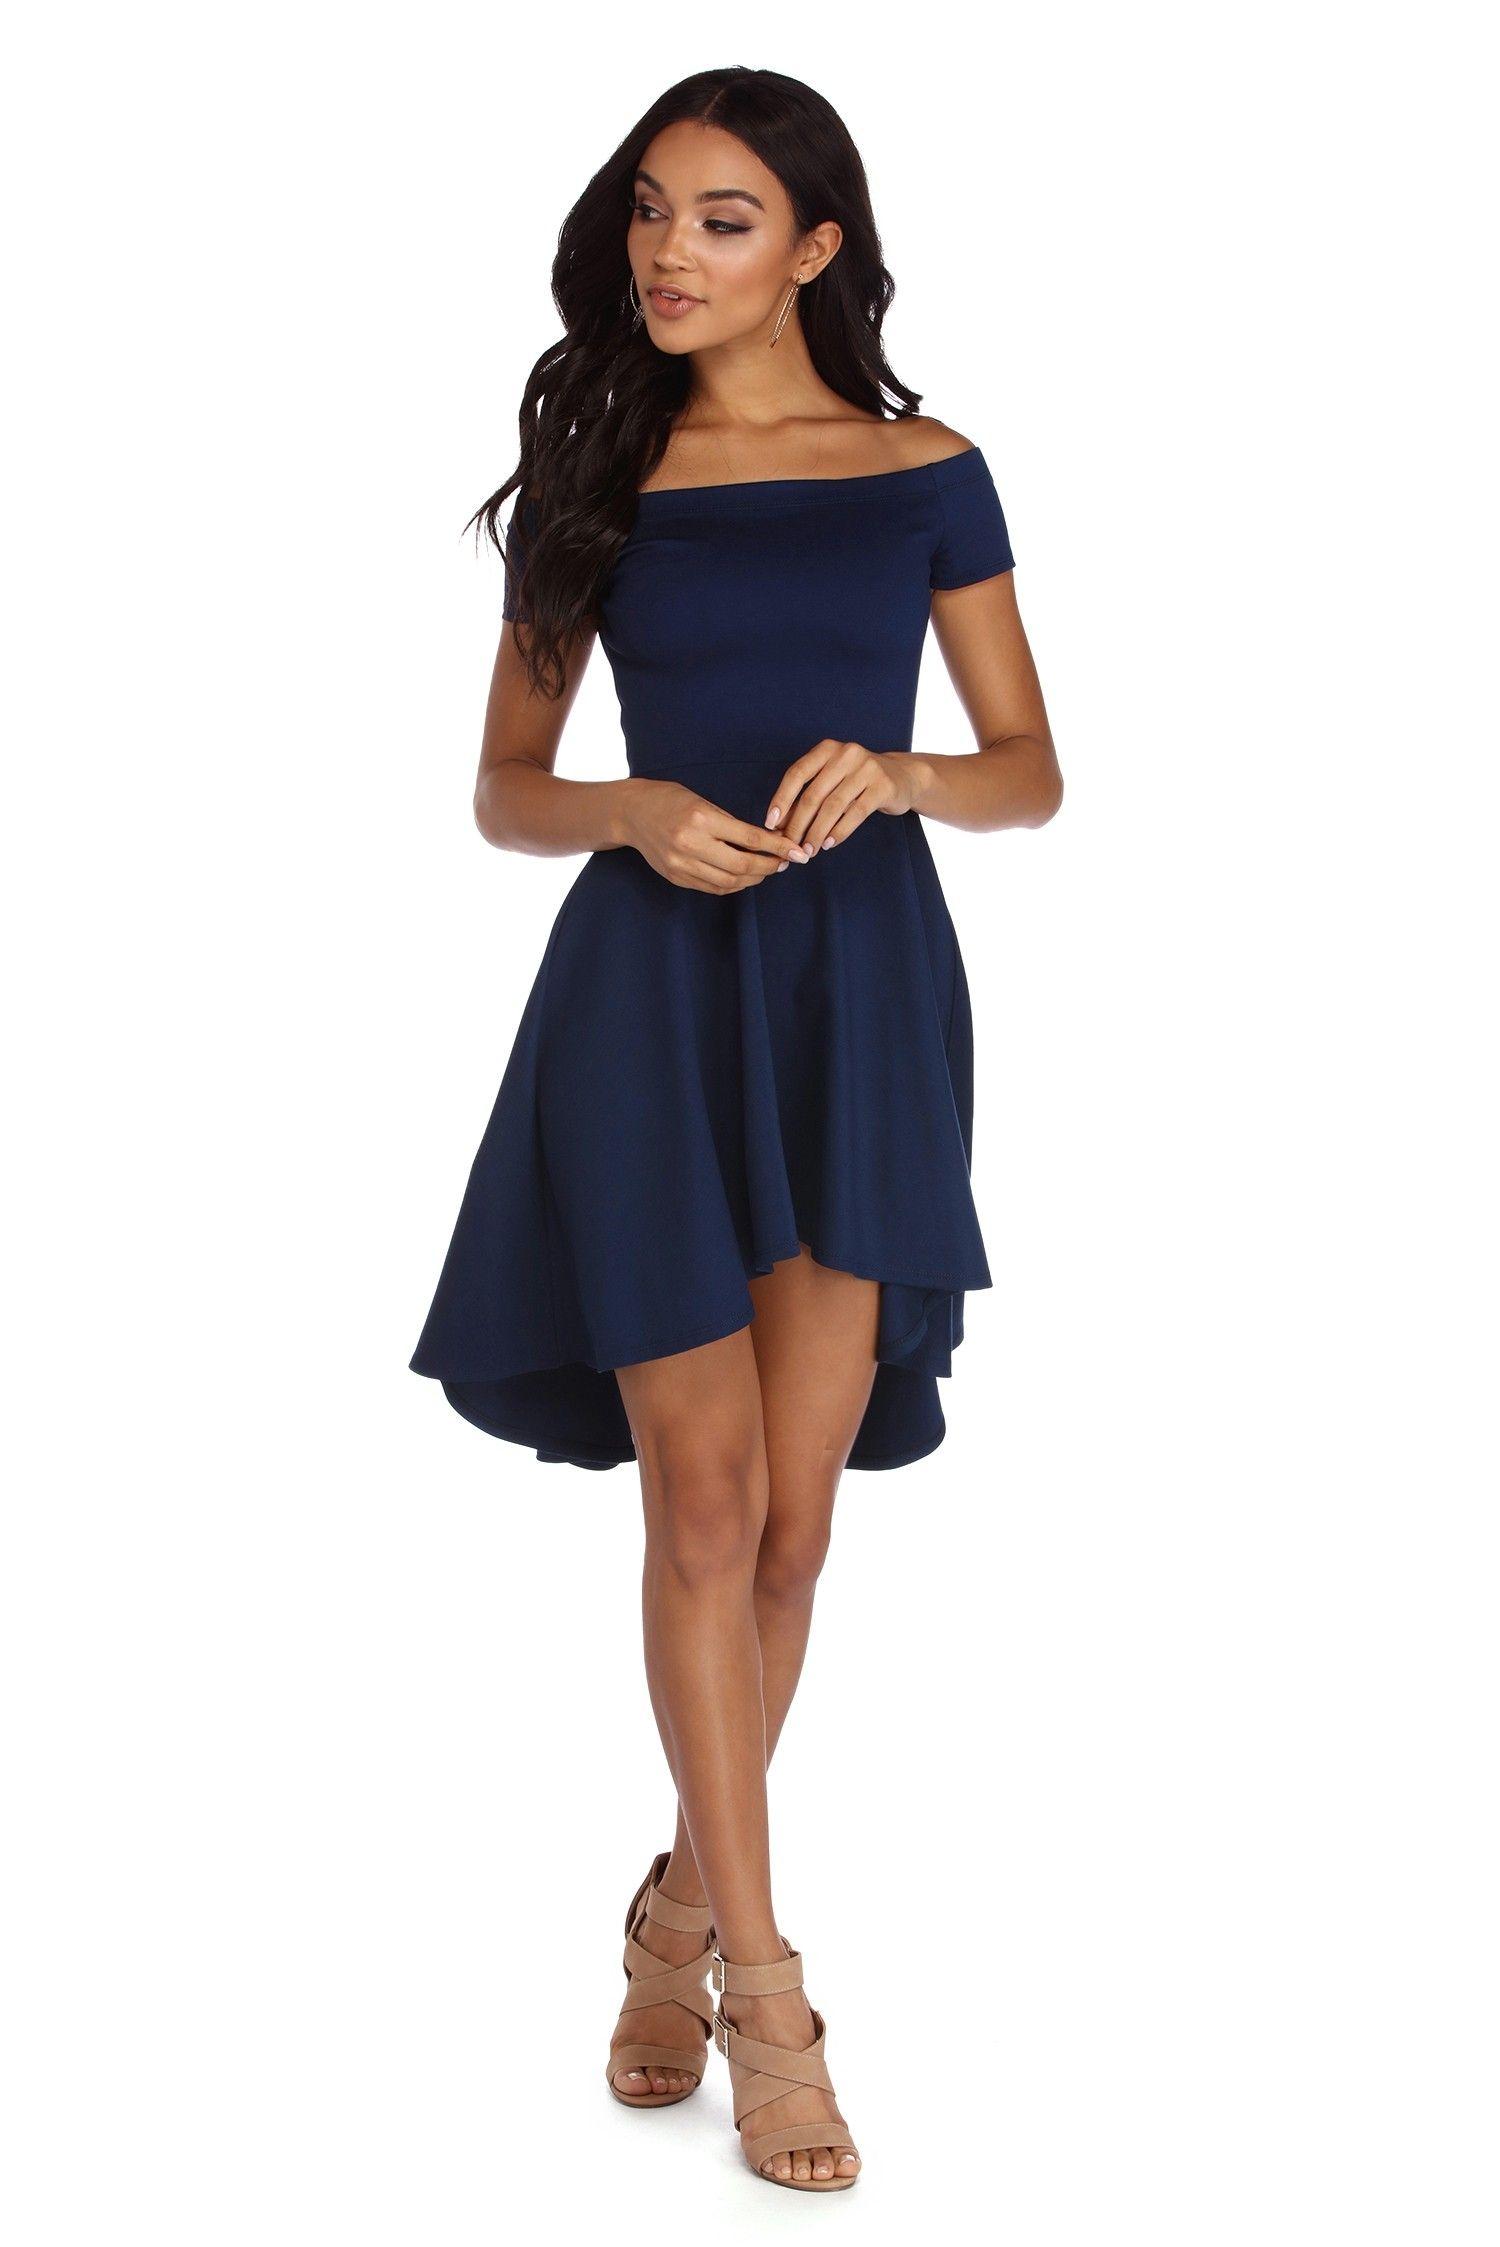 Navy Blue All The Rage Skater Dress Dresses Ball Gowns Skater Style Dress [ 2247 x 1500 Pixel ]